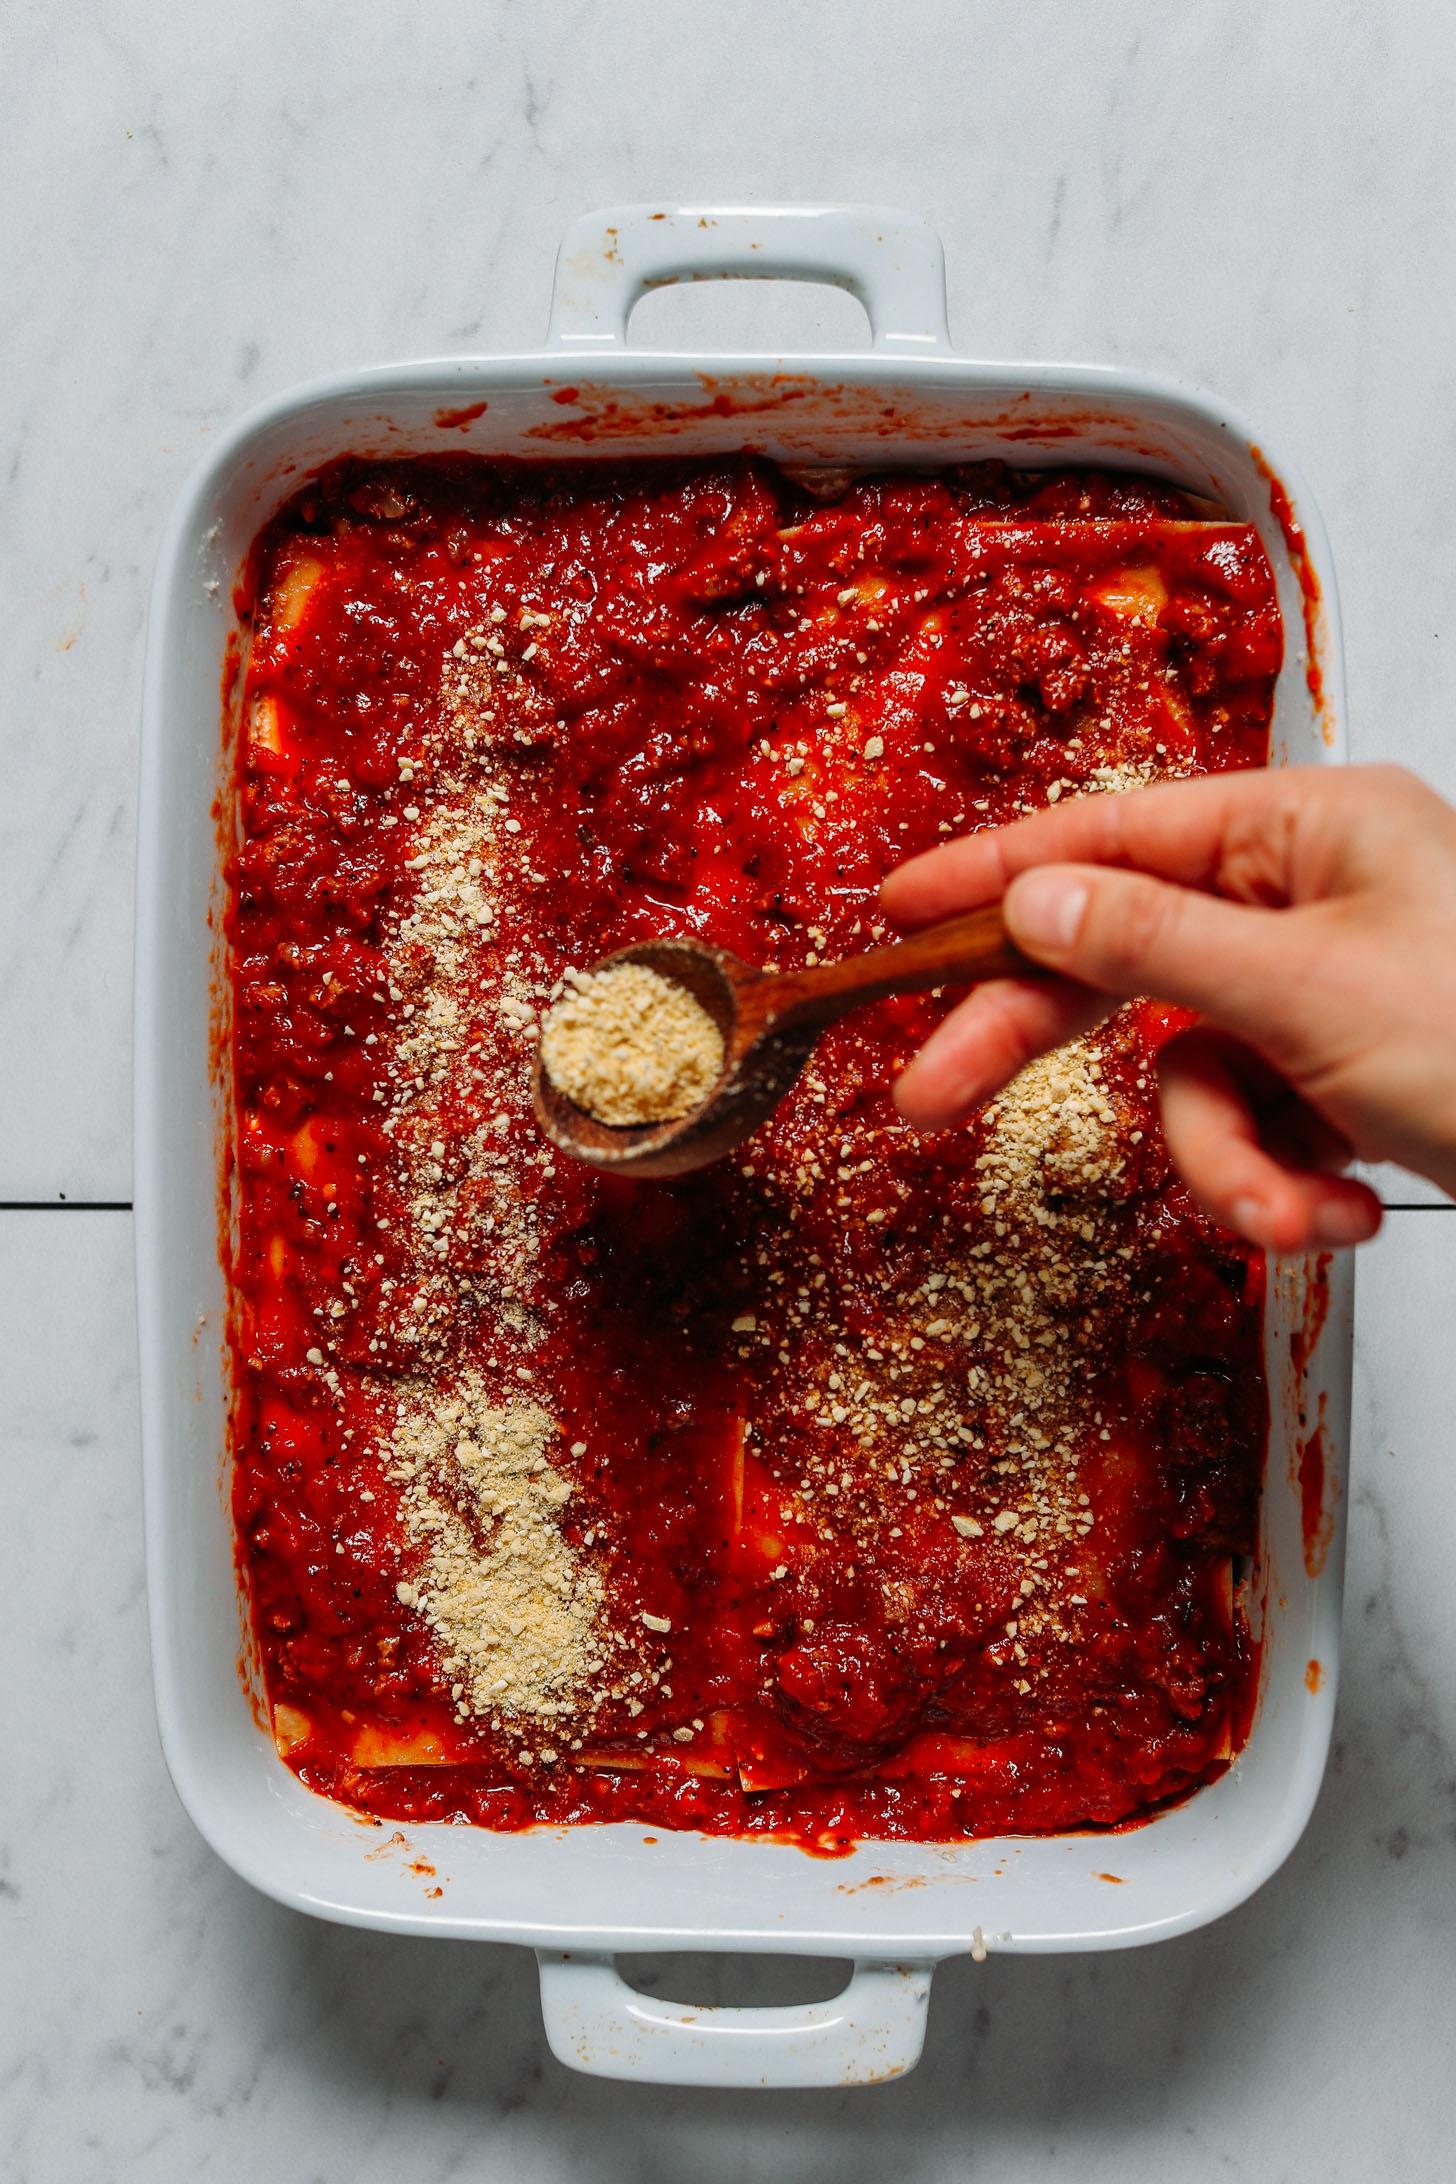 Sprinkling vegan parmesan cheese onto a pan of our gluten free lasagna